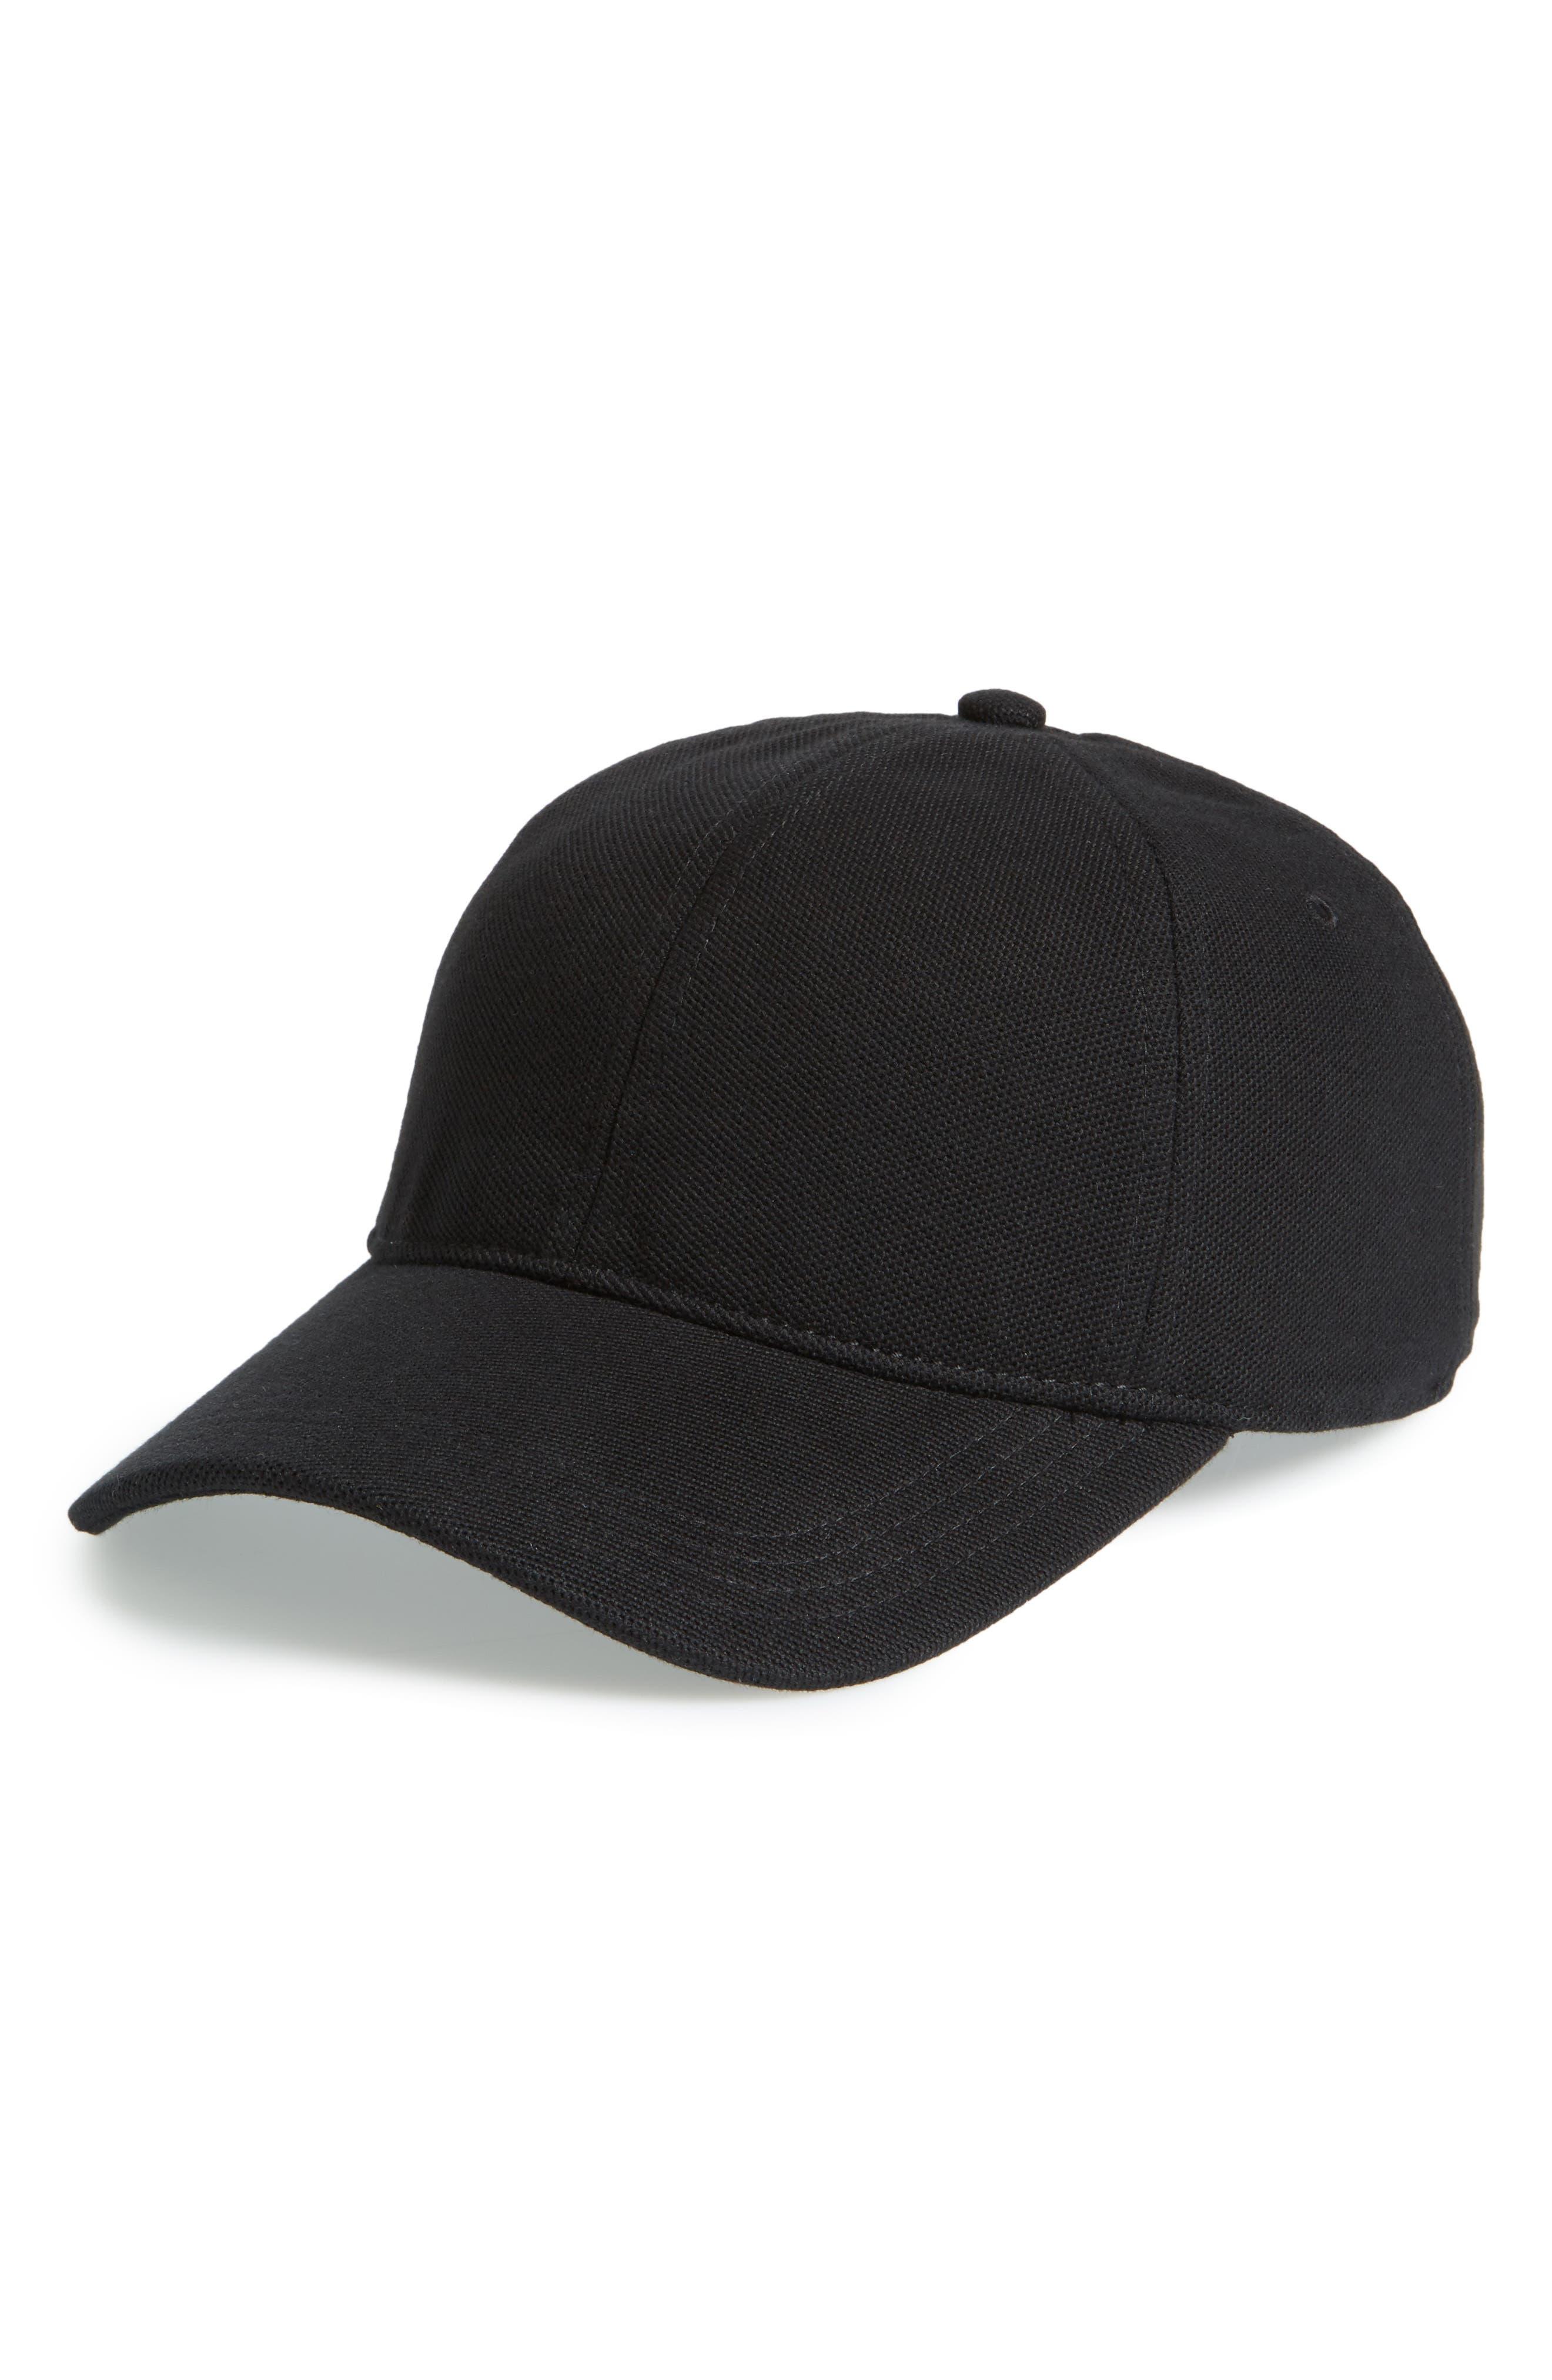 Lacoste Croc Cotton Baseball Cap